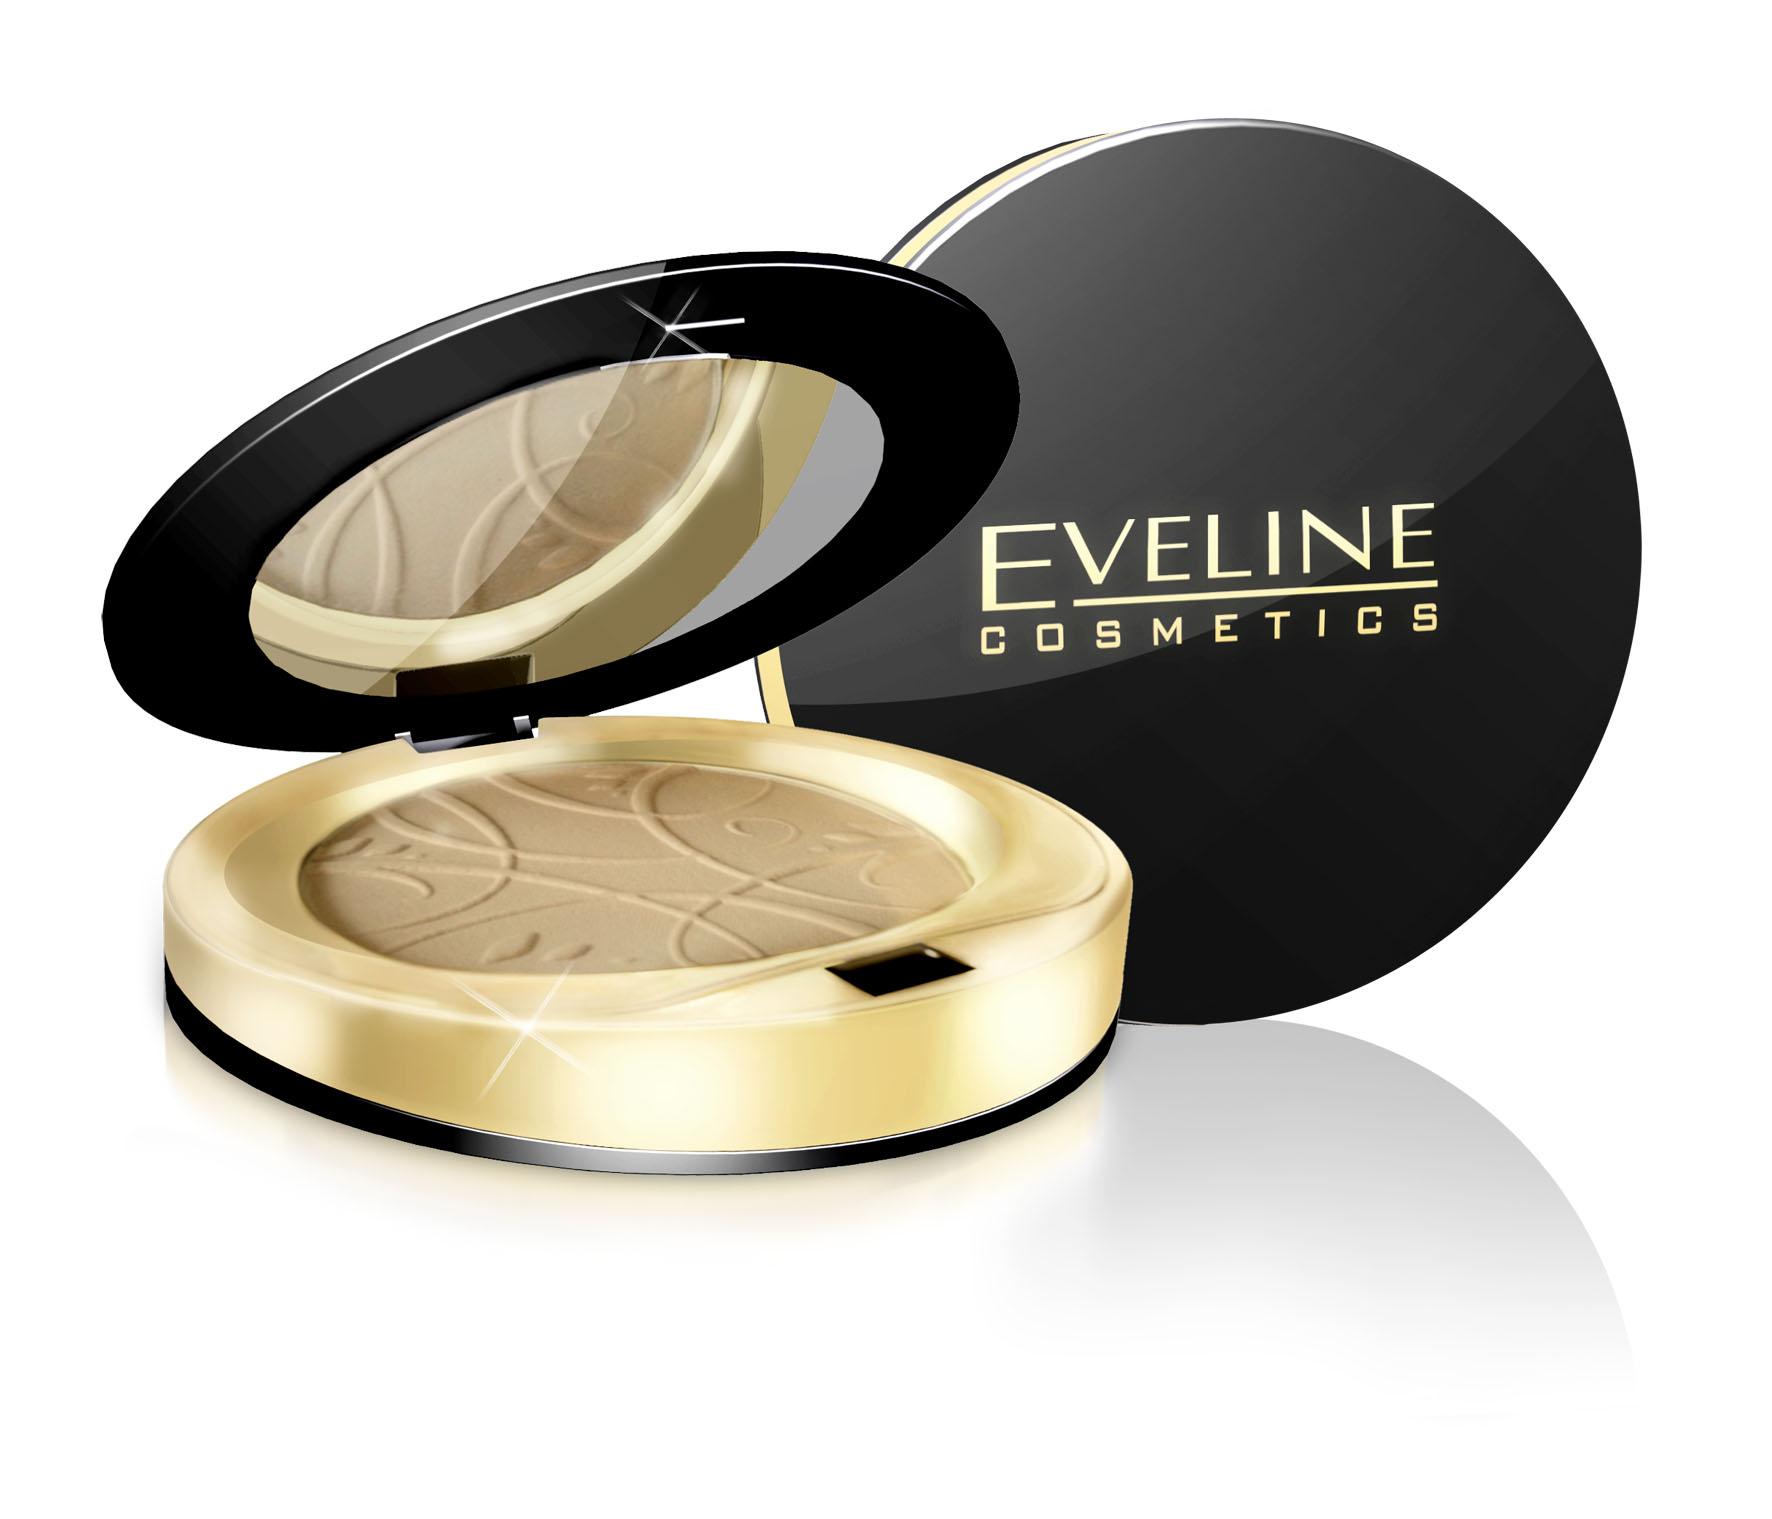 Eveline celebritie beauty (тон 21) пудра.